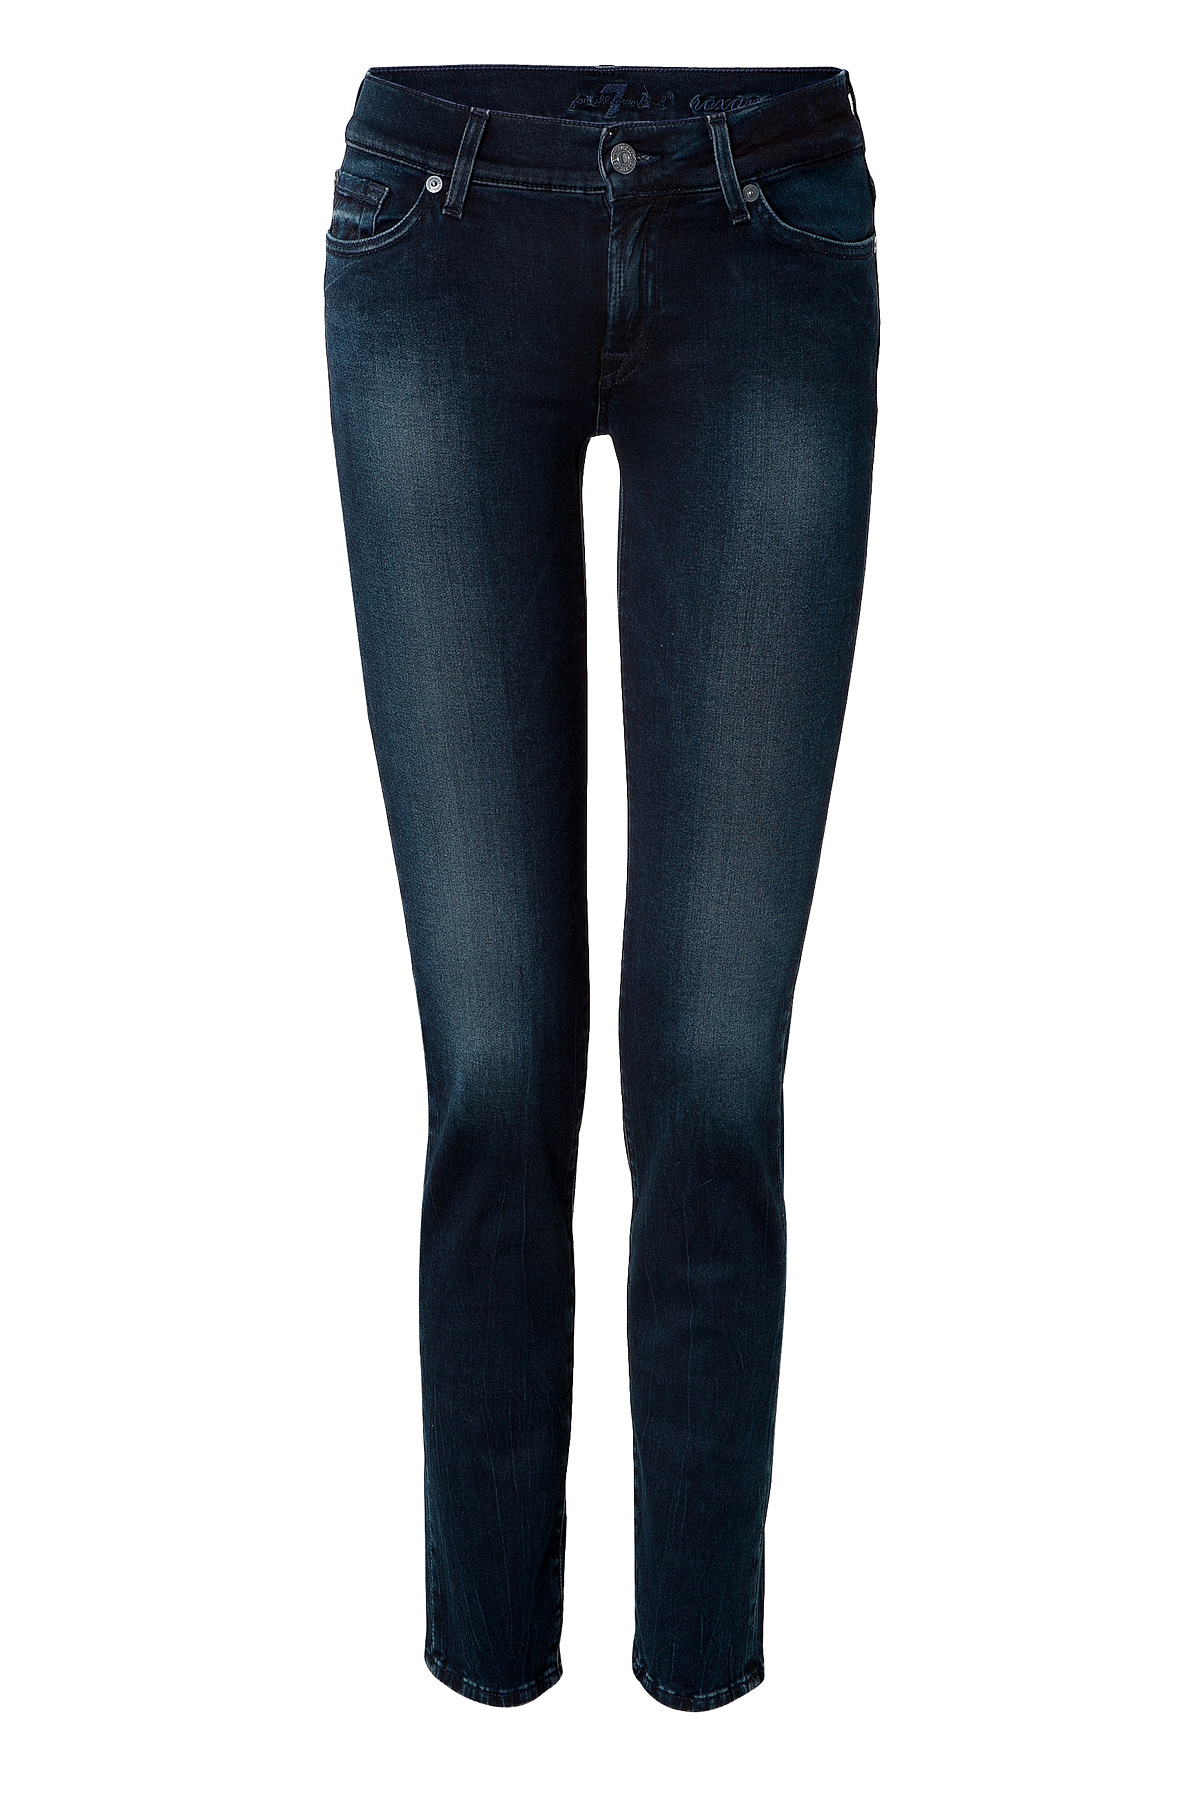 7 for all mankind roxanne skinny jeans in high dark indigo. Black Bedroom Furniture Sets. Home Design Ideas